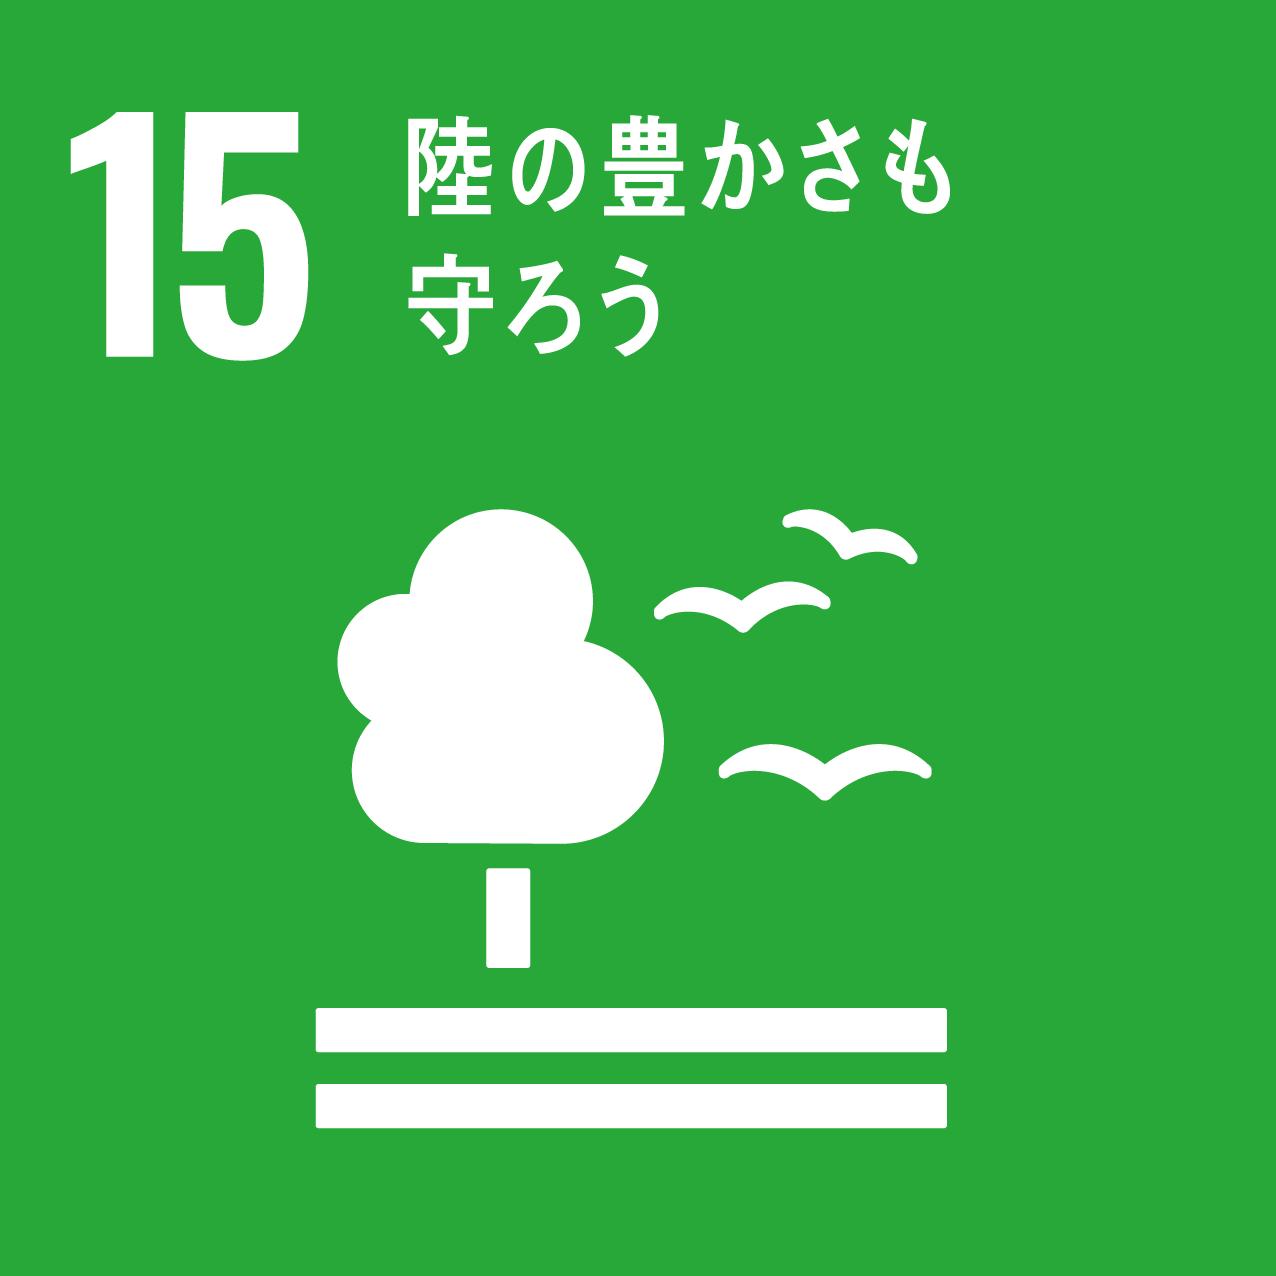 SDGs目標アイコン 15.陸の豊かさも守ろう